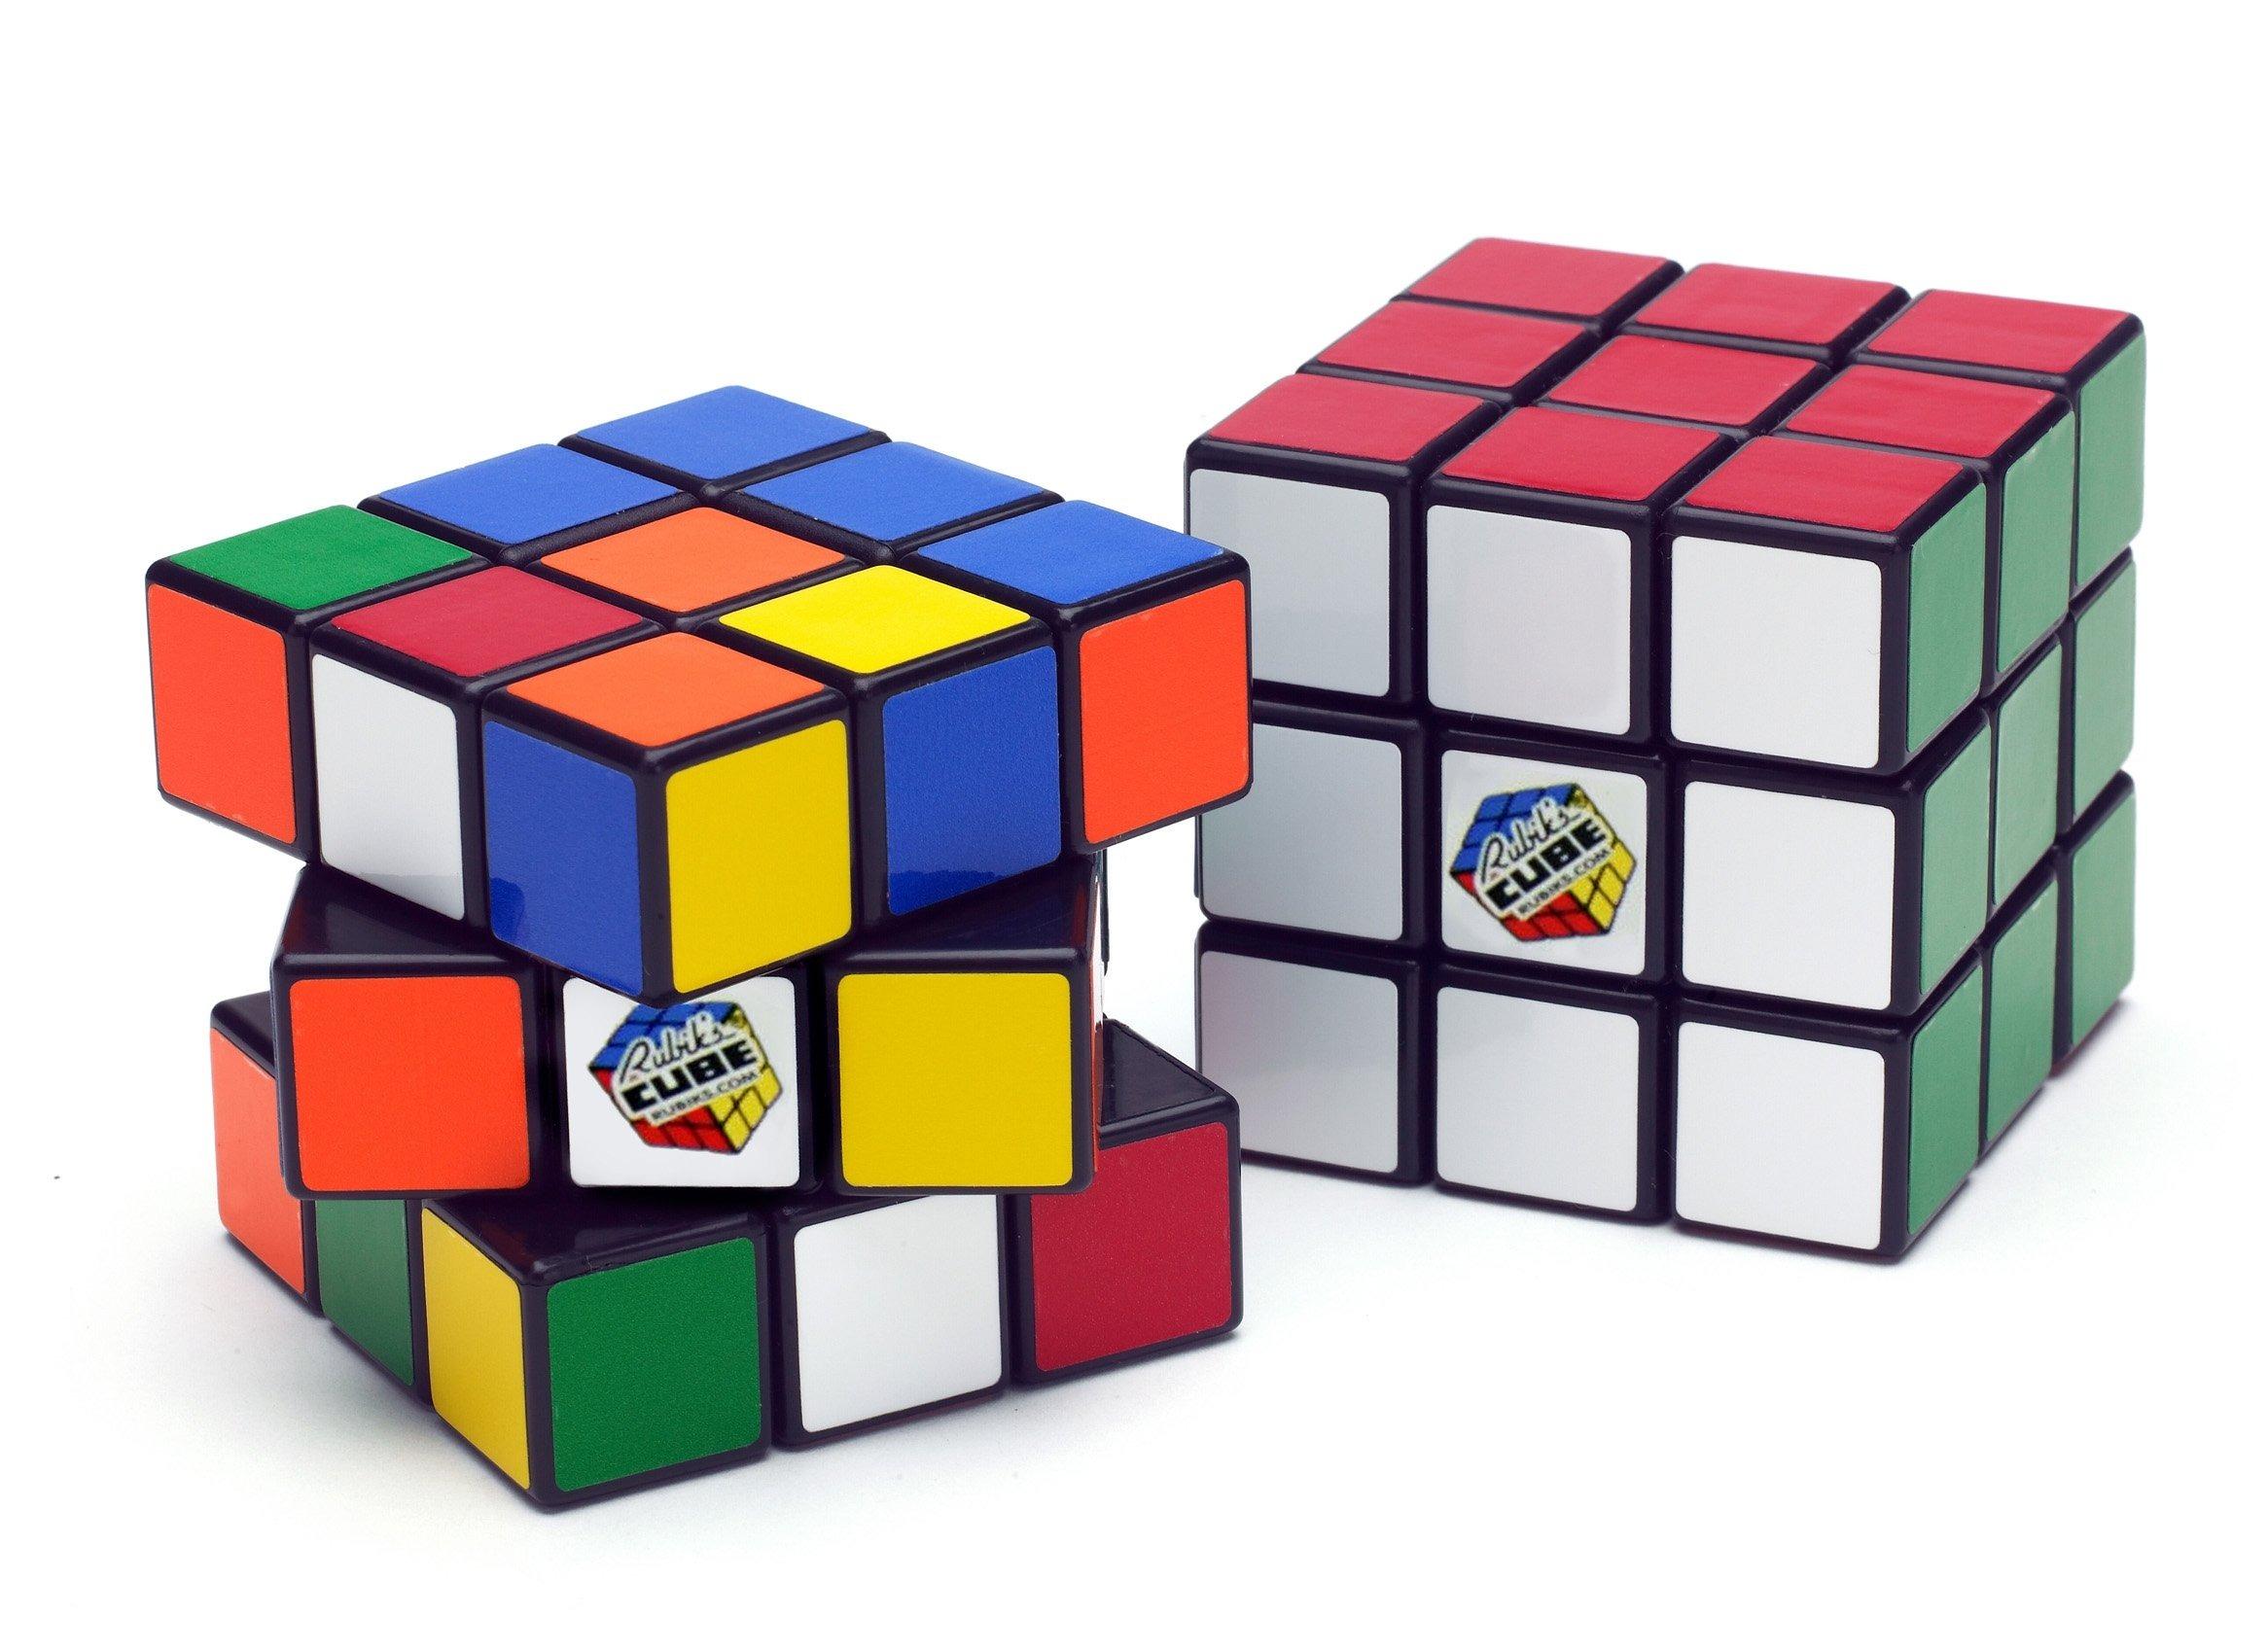 Rubiks Cube - 3x3